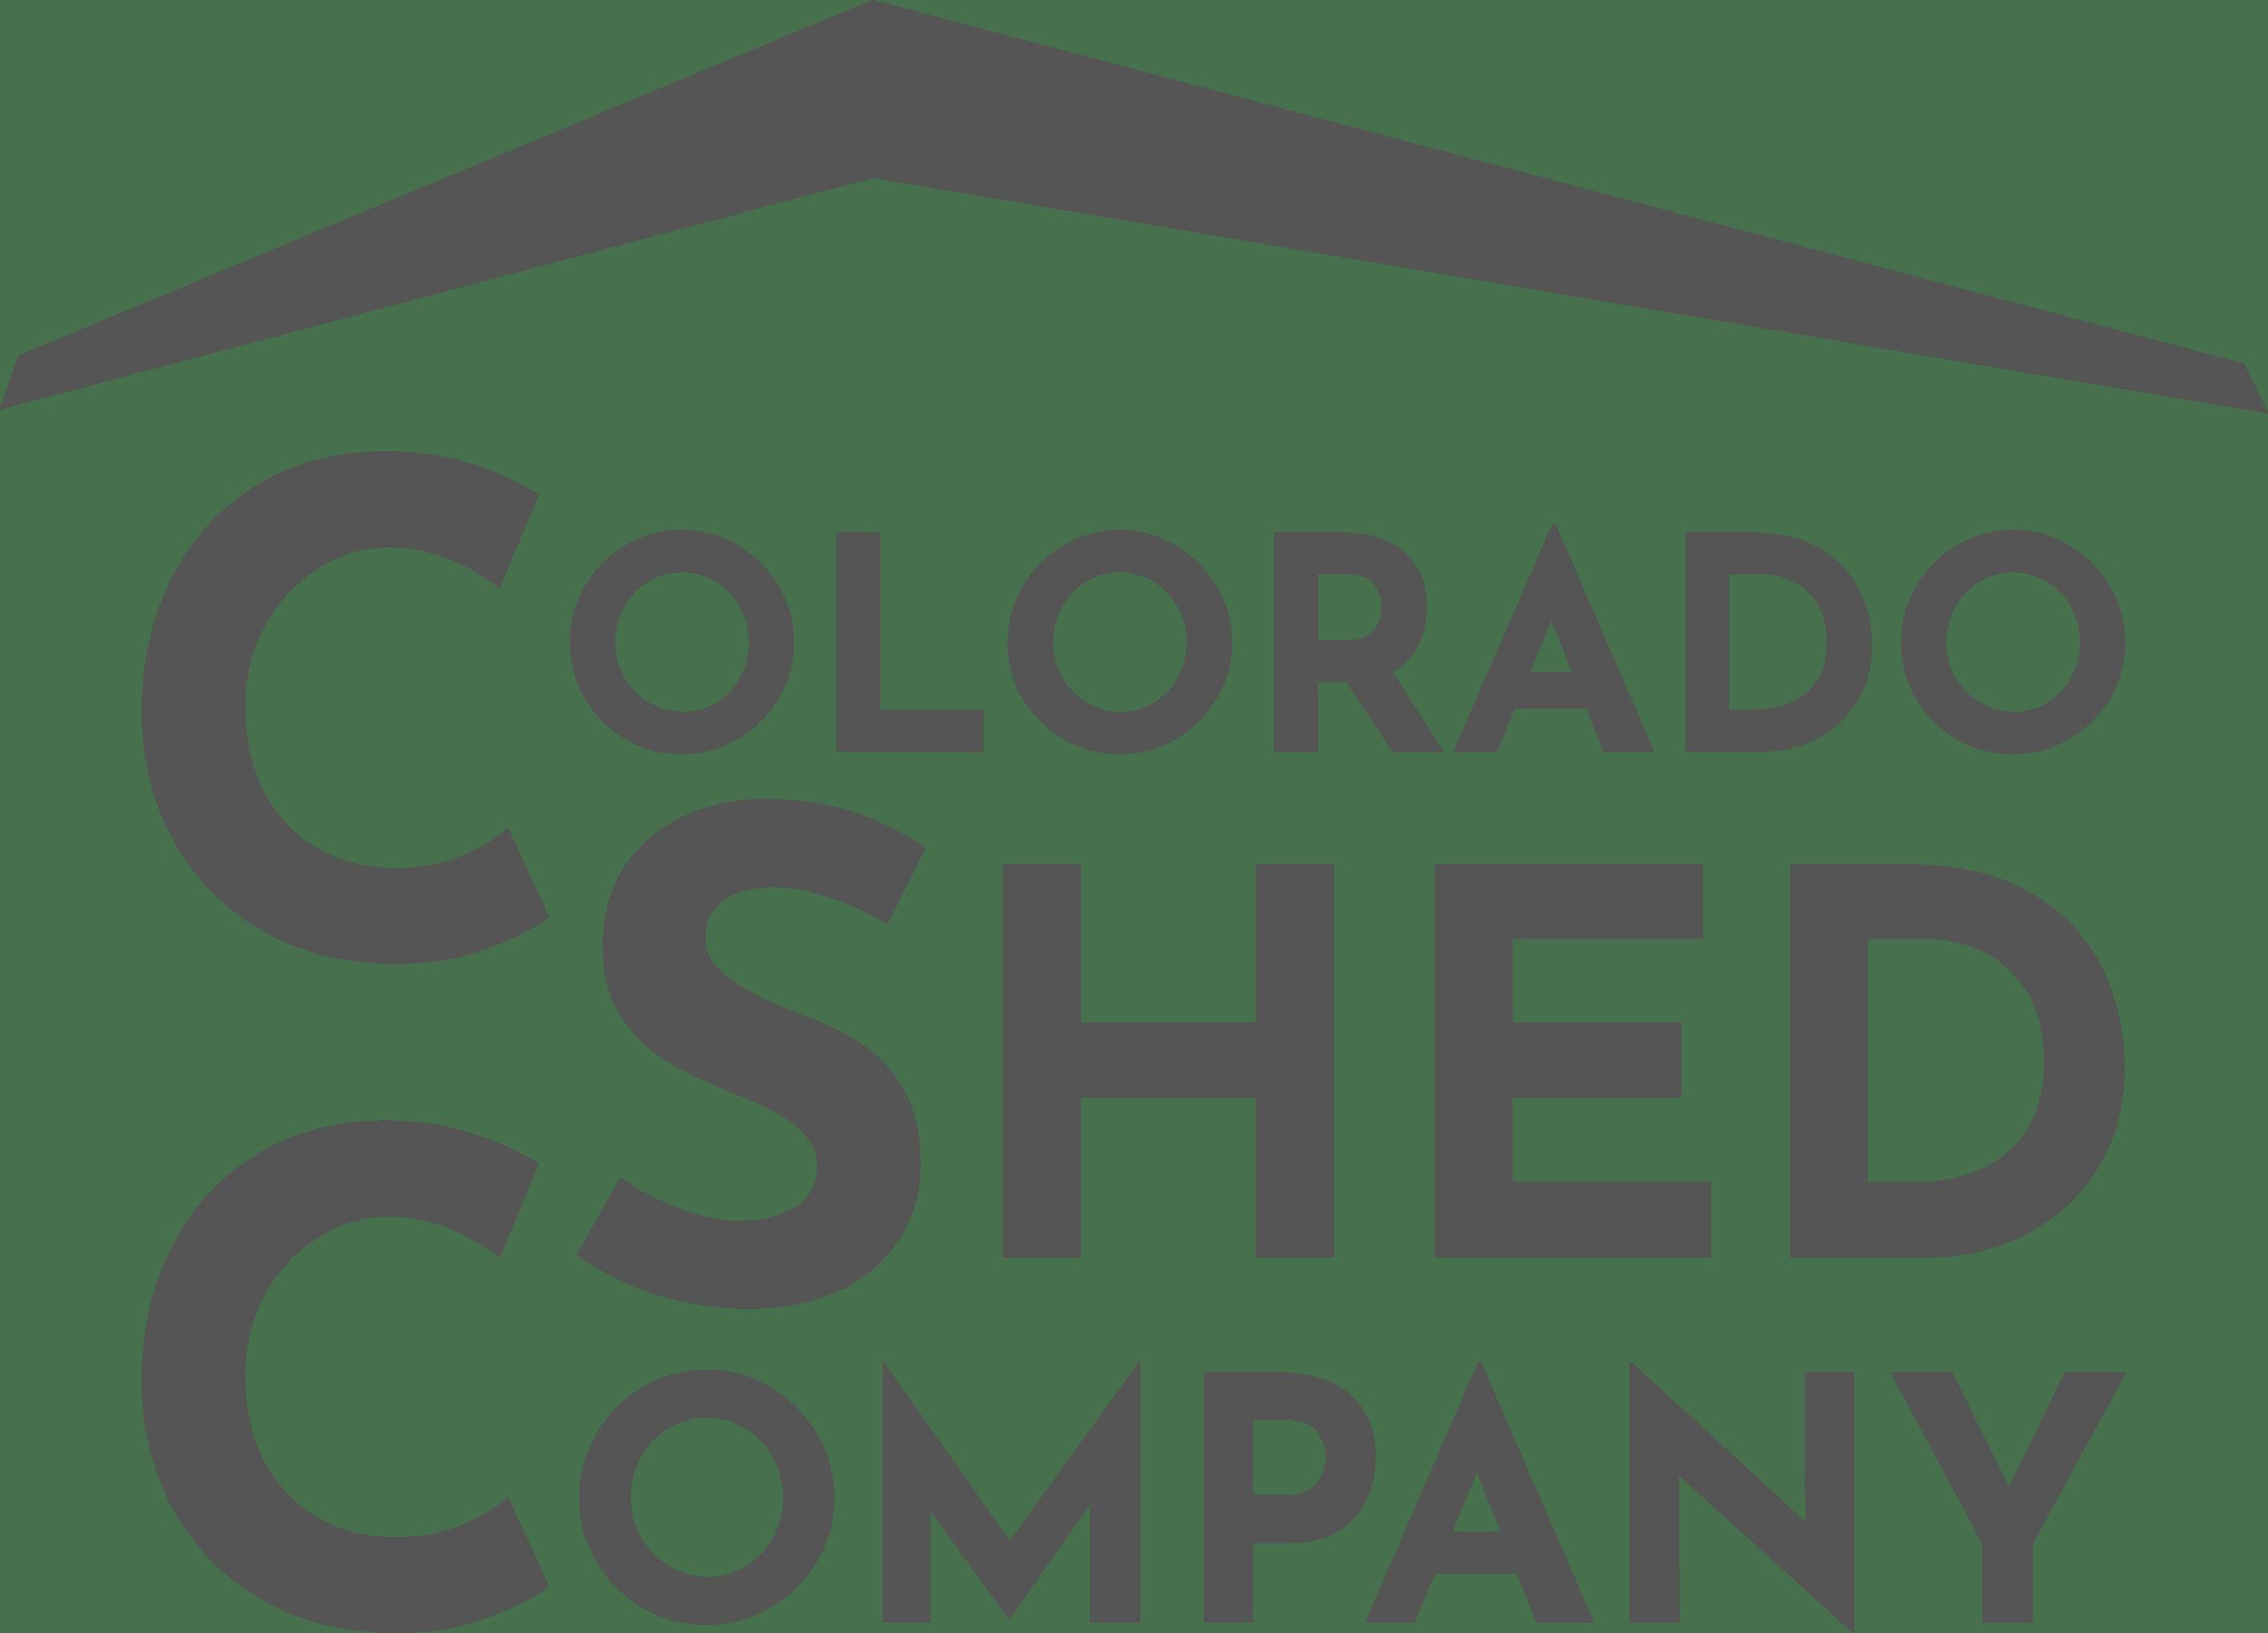 Colorado Shed Company